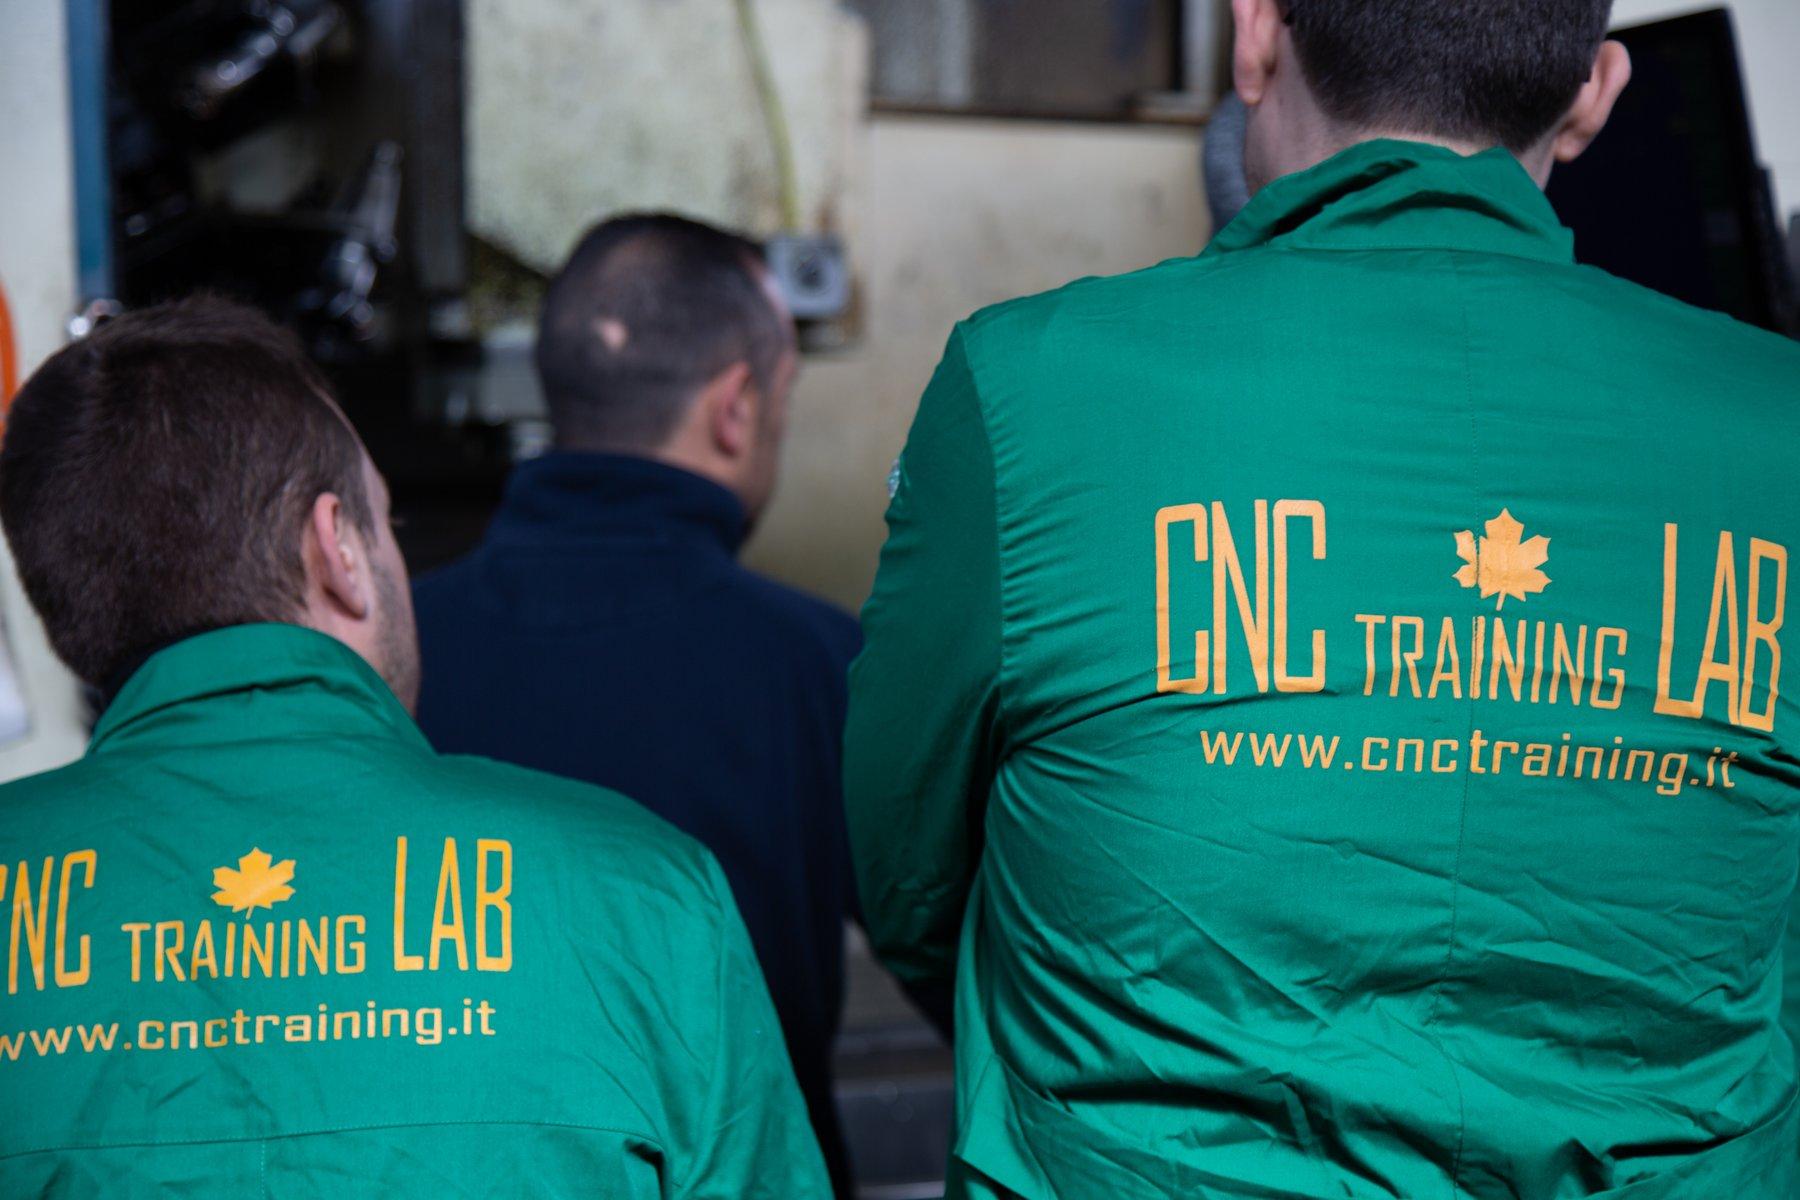 cnc-training-lab-corsi-cnc